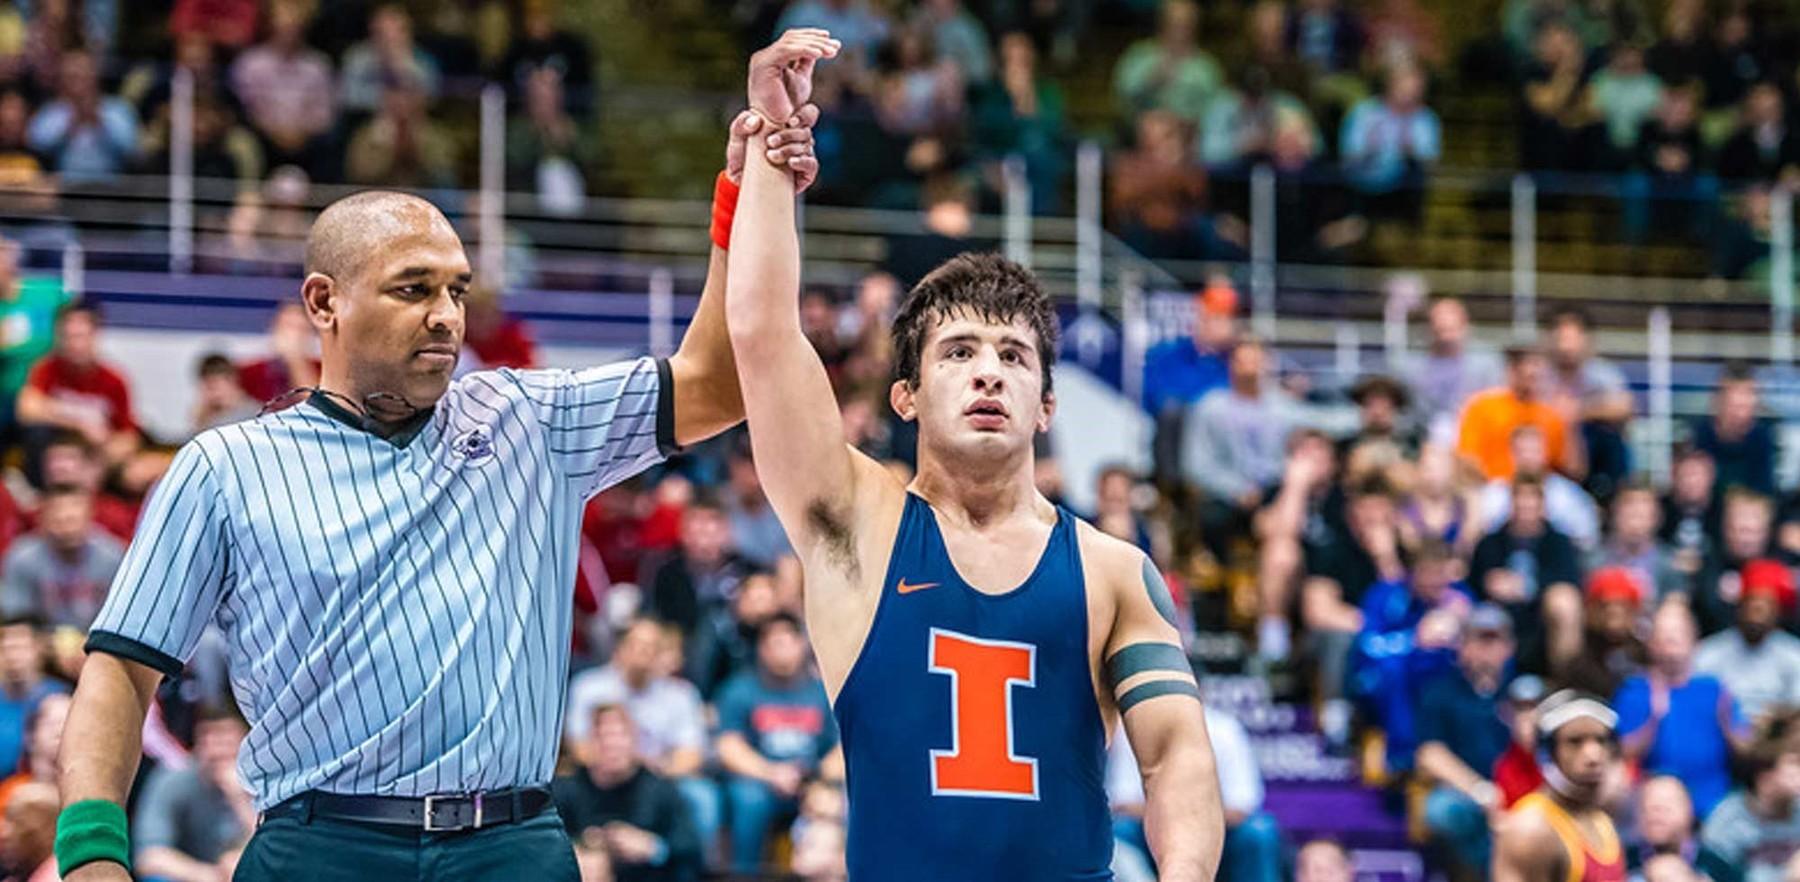 Isaiah Martinez, hand held aloft in victory